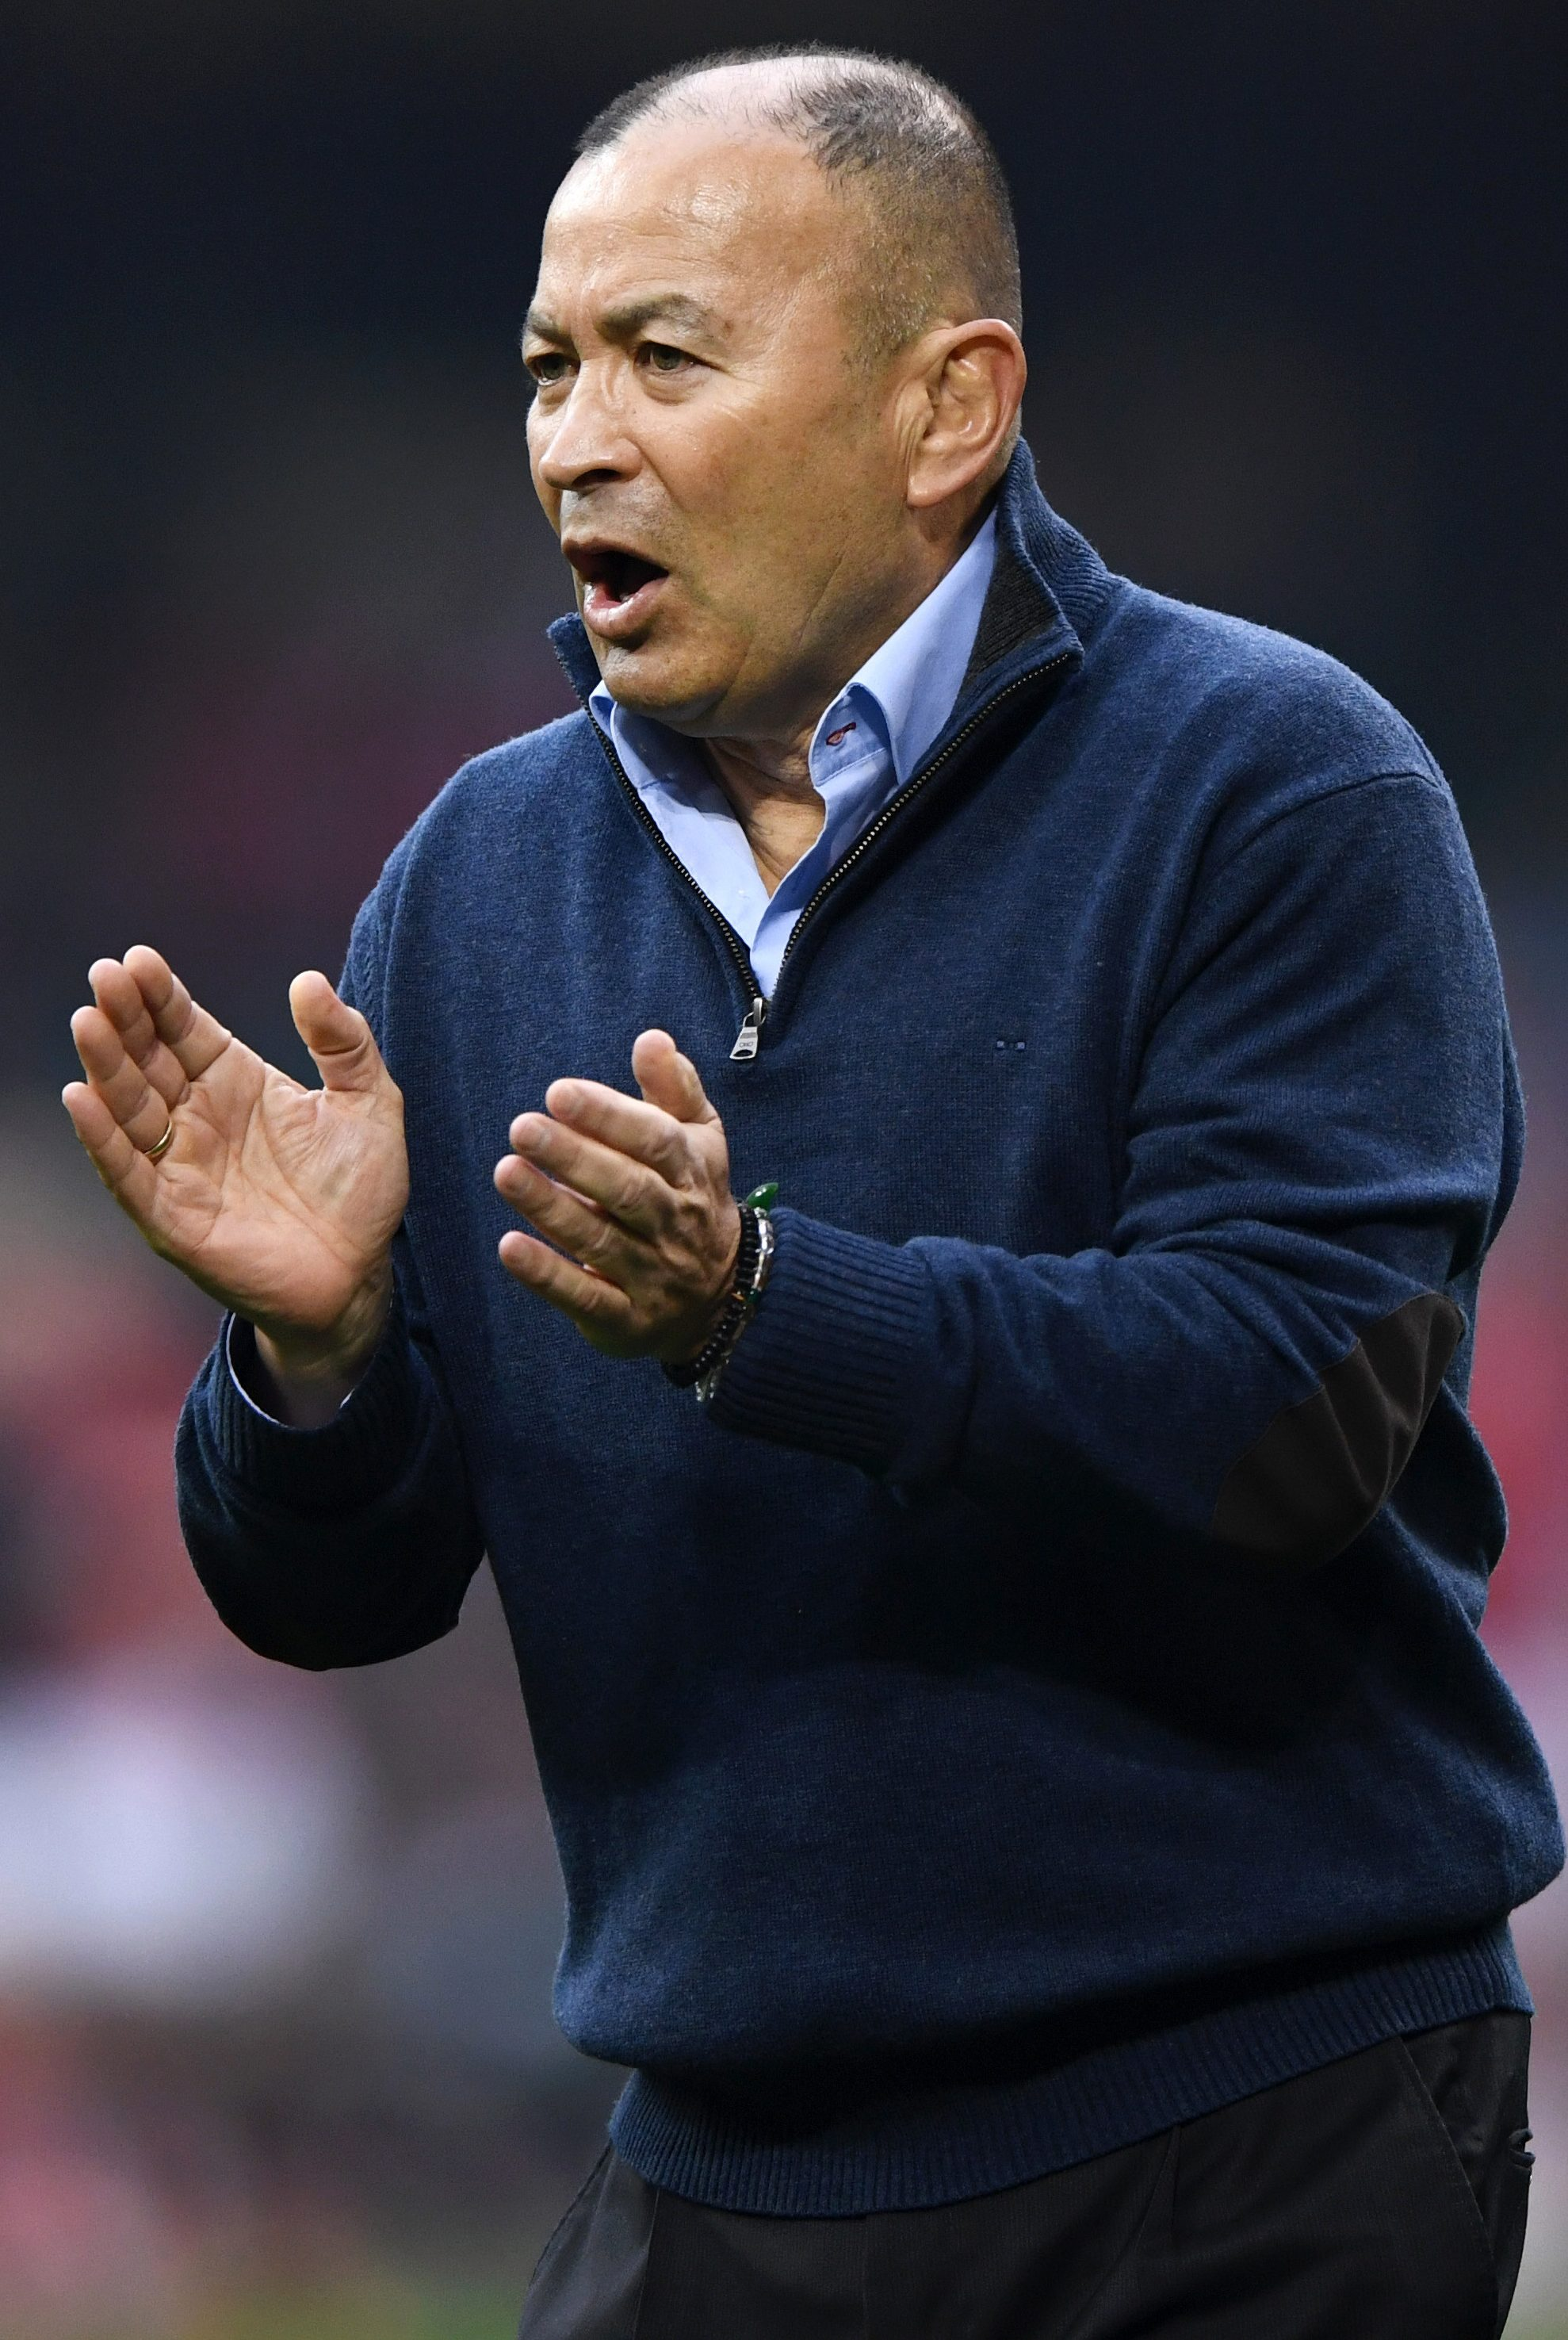 England boss Eddie Jones has taken a tough line in the past on misbehaving stars